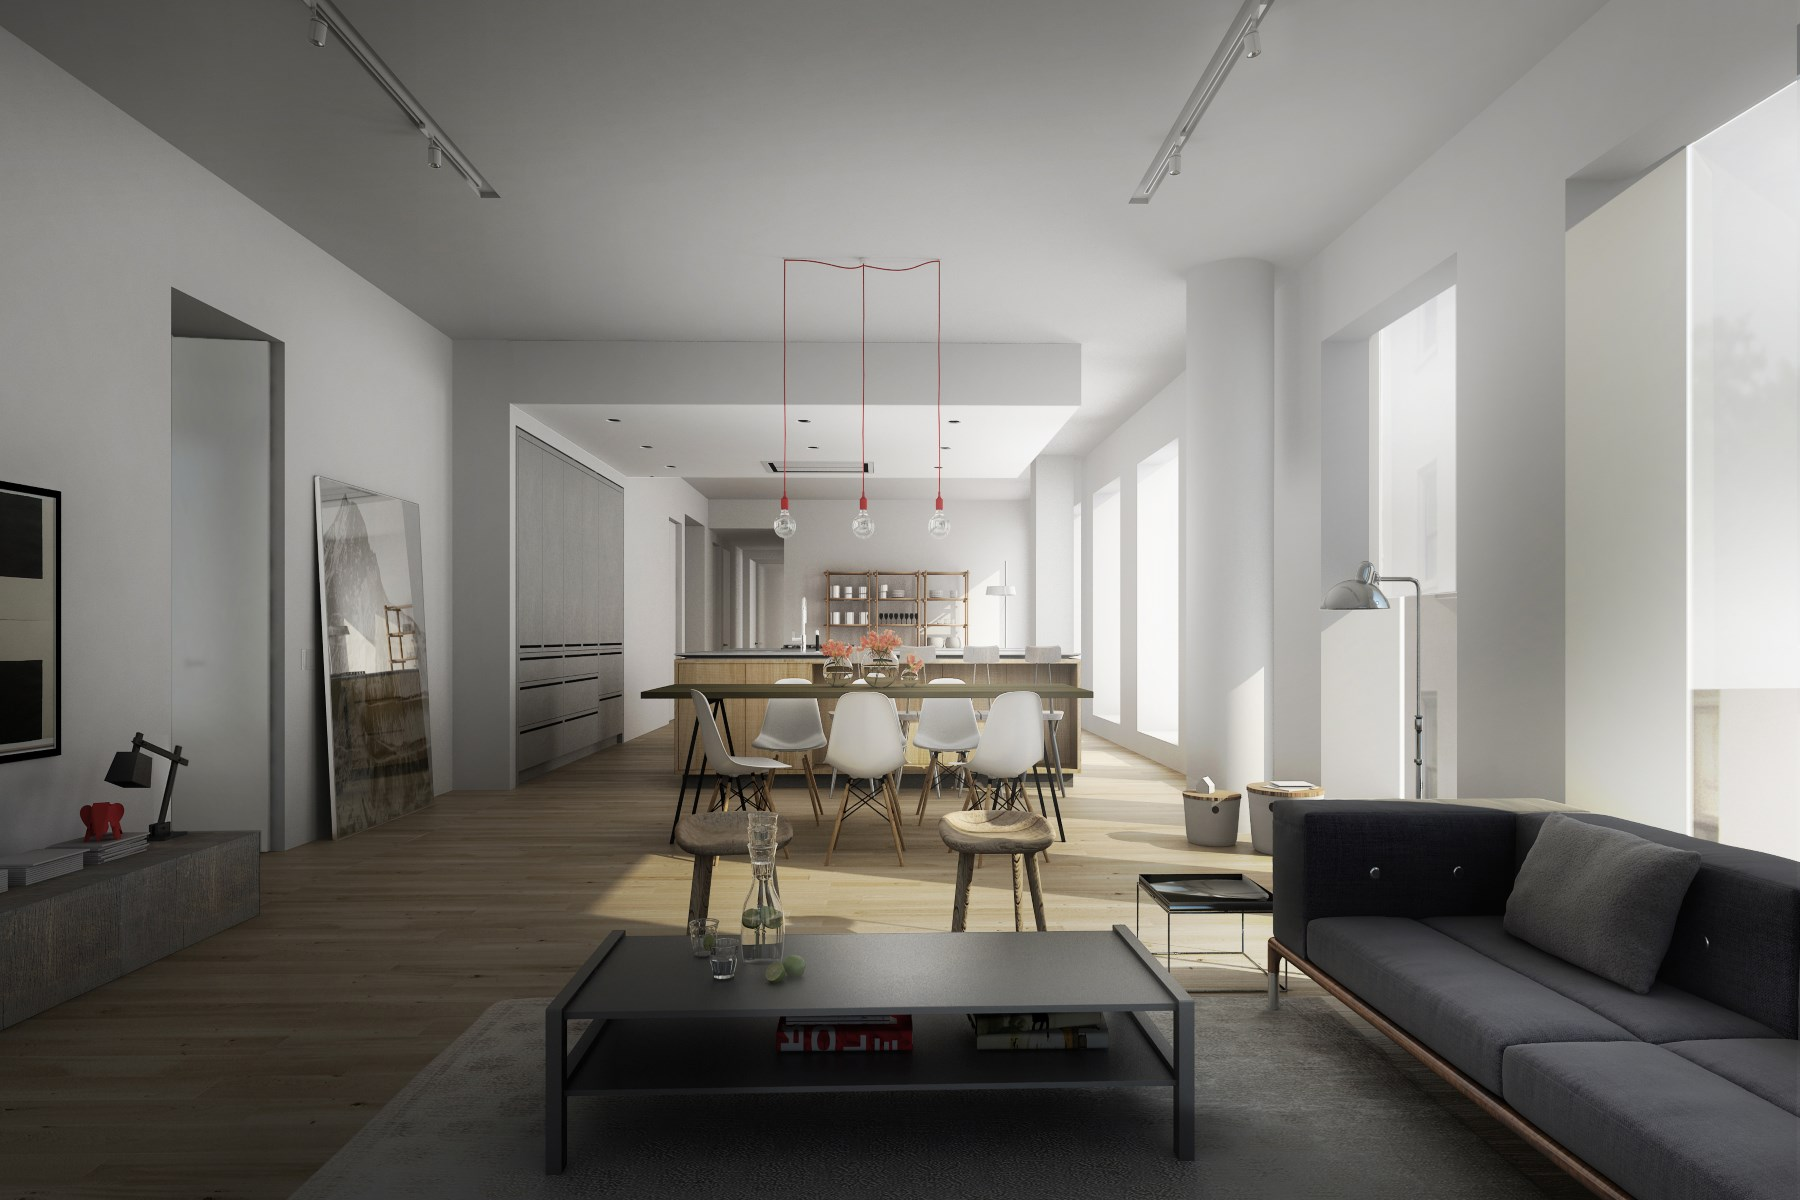 Condominium for Sale at 1 John Street, PHA 1 John Street Apt PHA Dumbo, Brooklyn, New York, 11201 United States